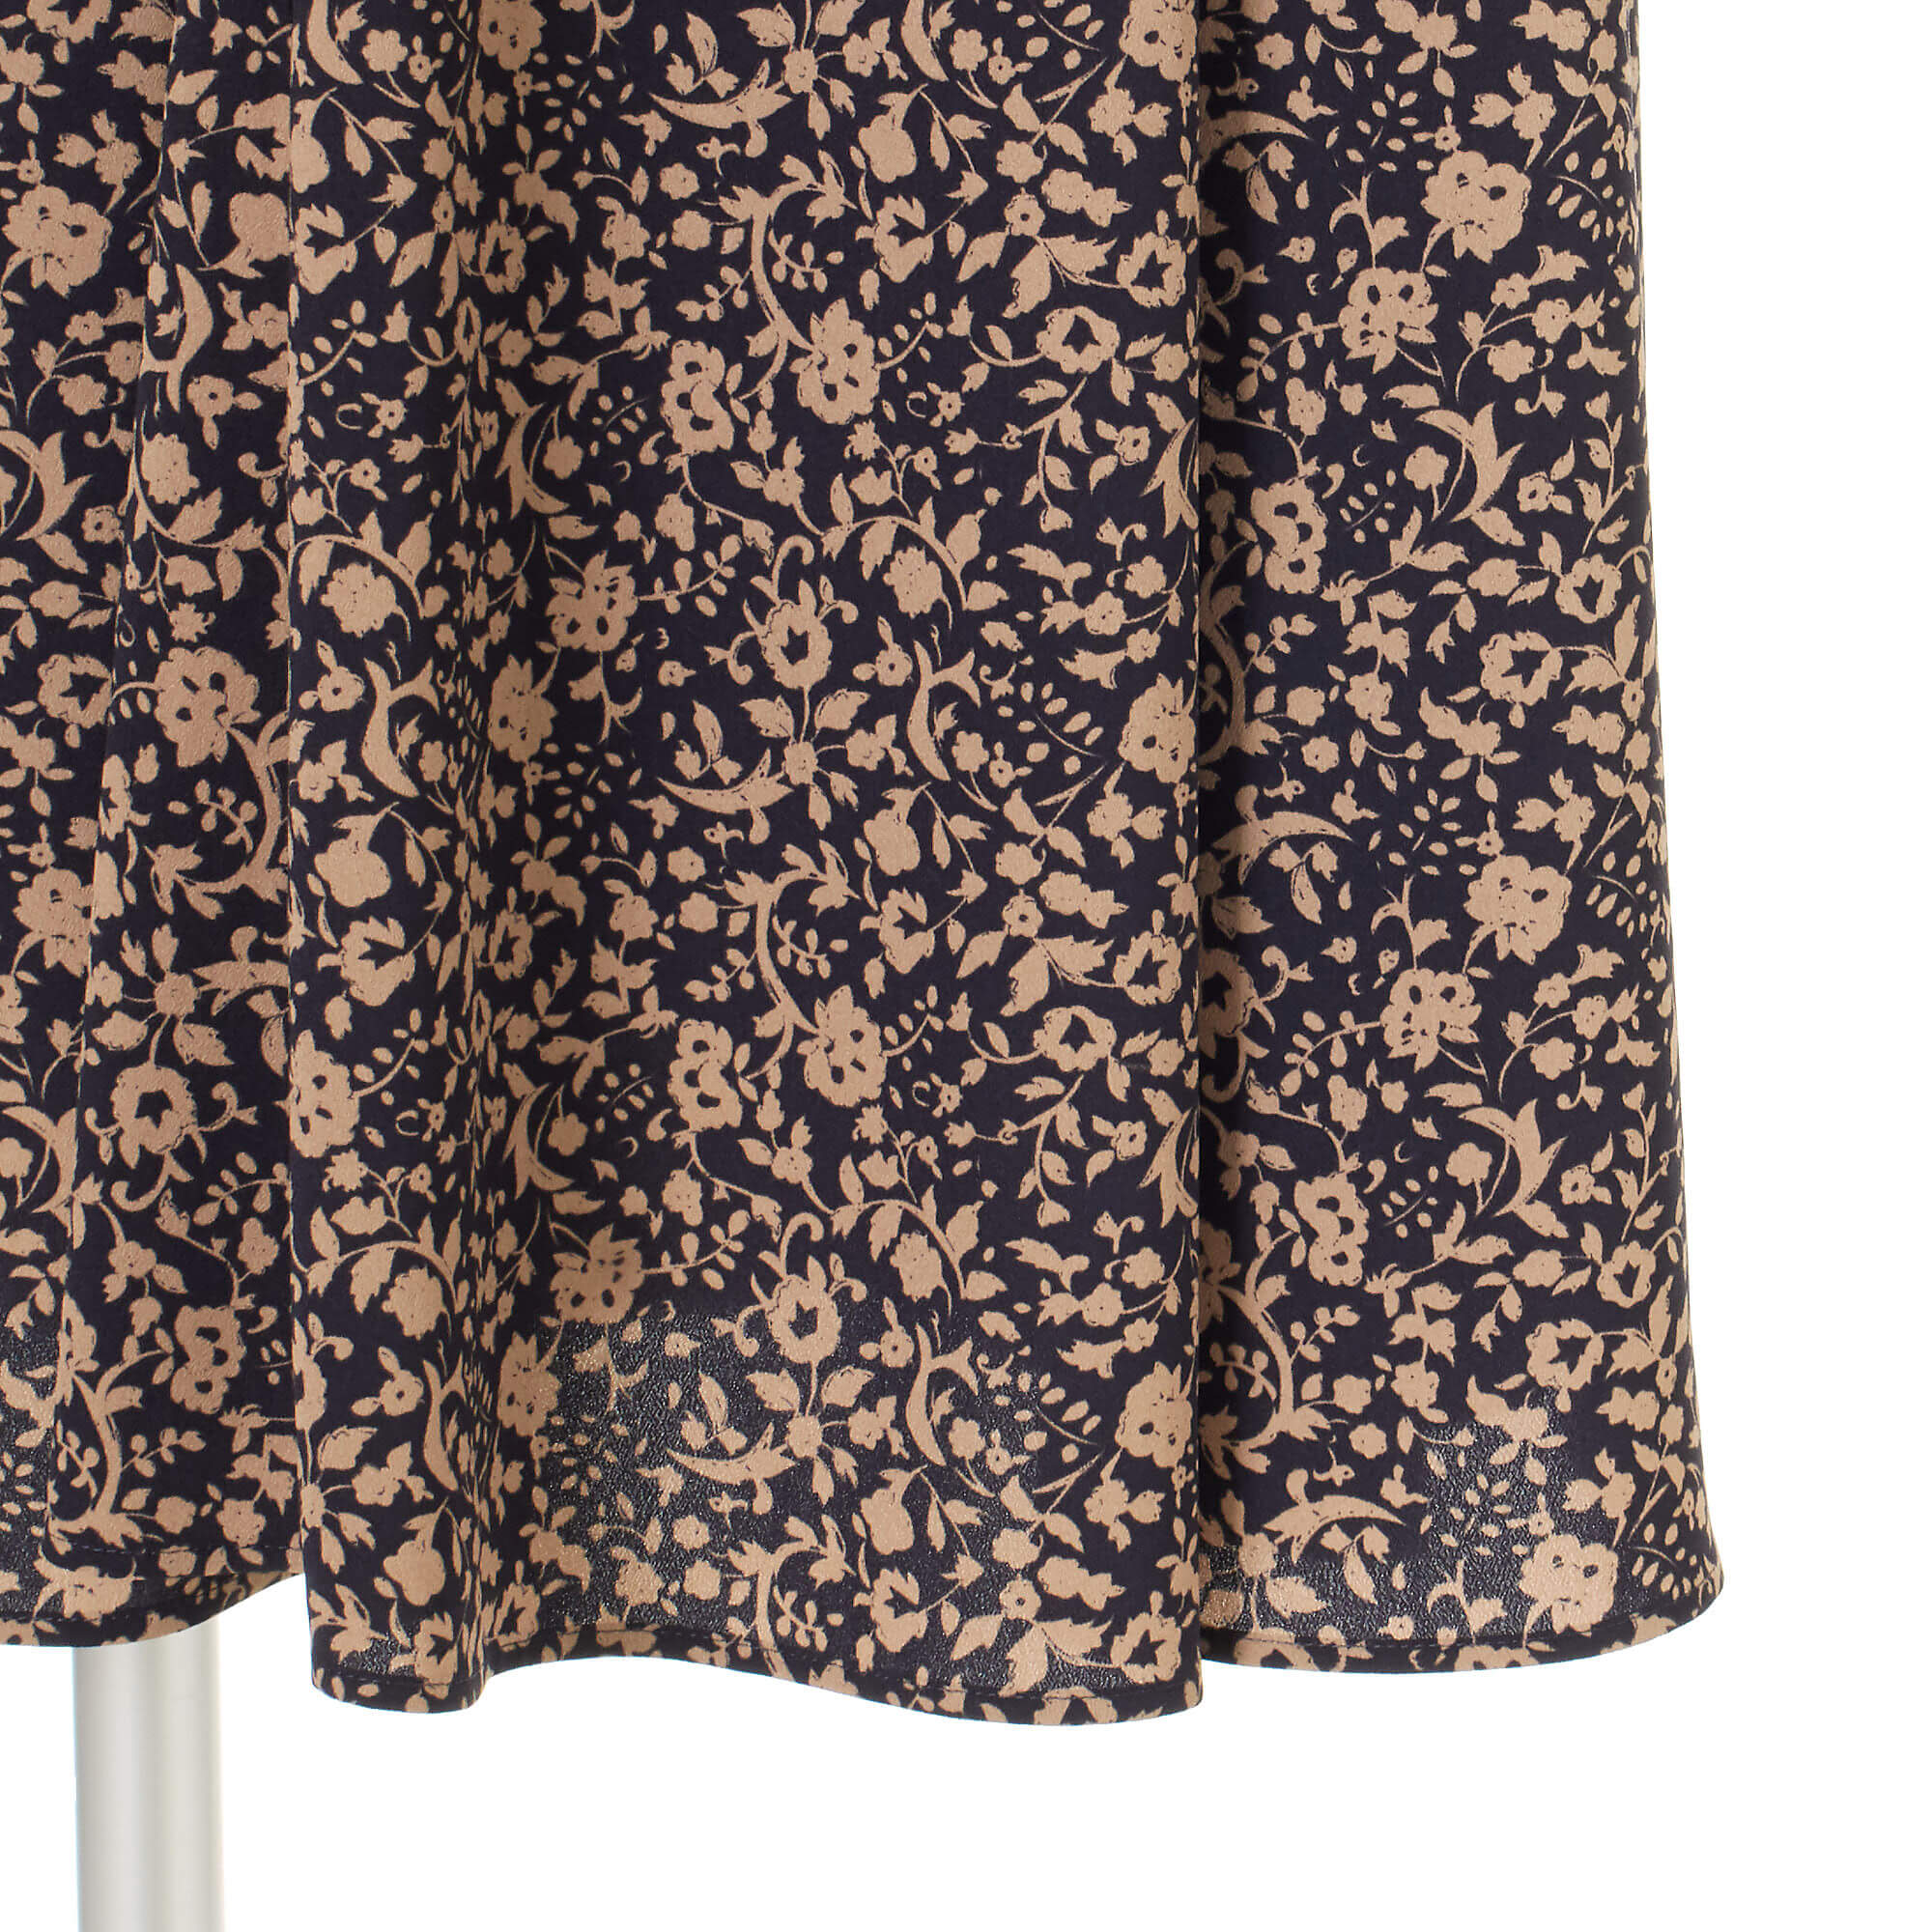 12closet 小花柄フレアスカート